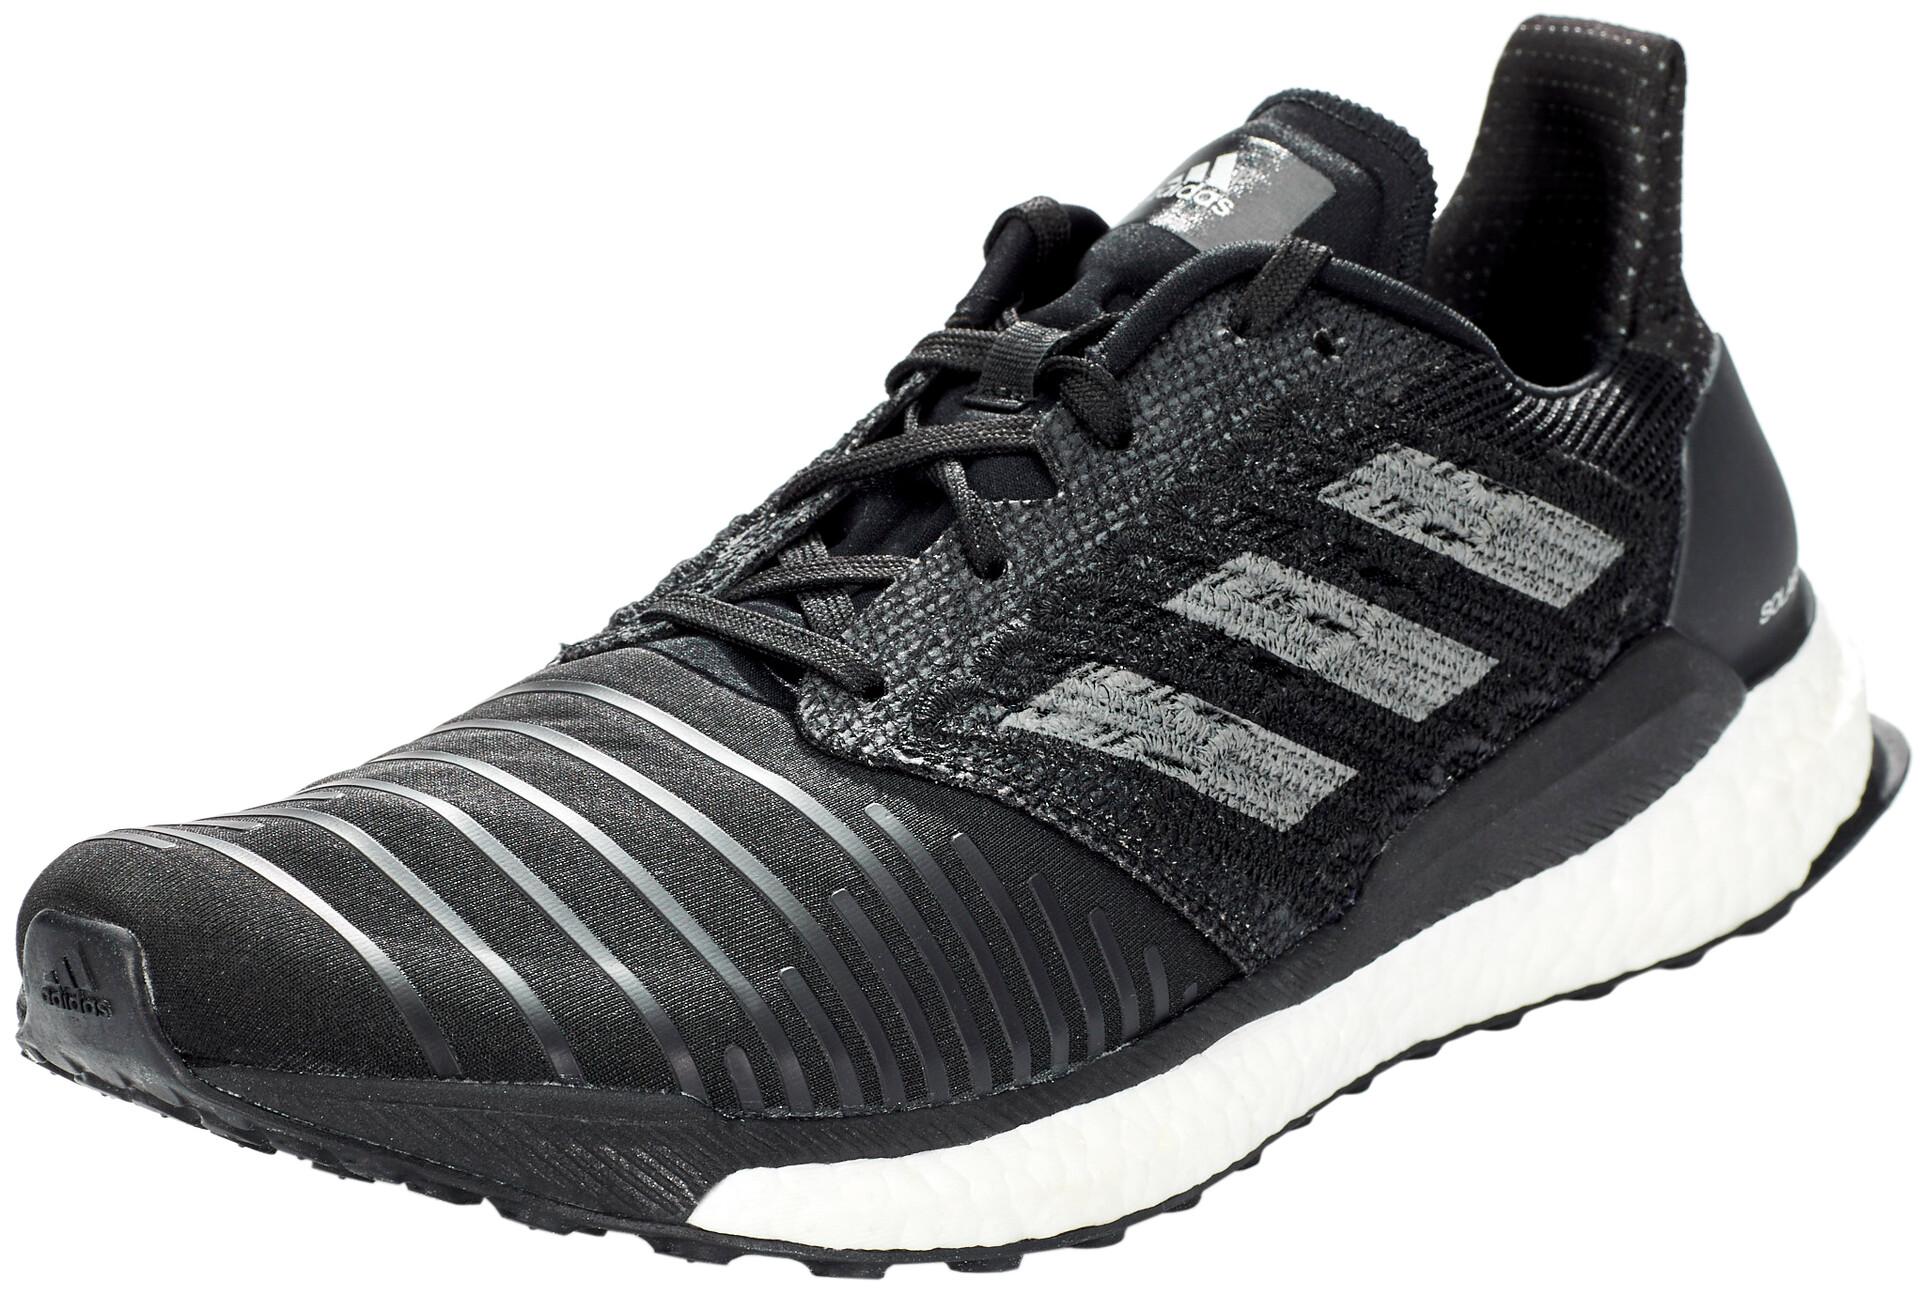 adidas SolarBoost Chaussures de trail Homme, core blackgrey fourwhite